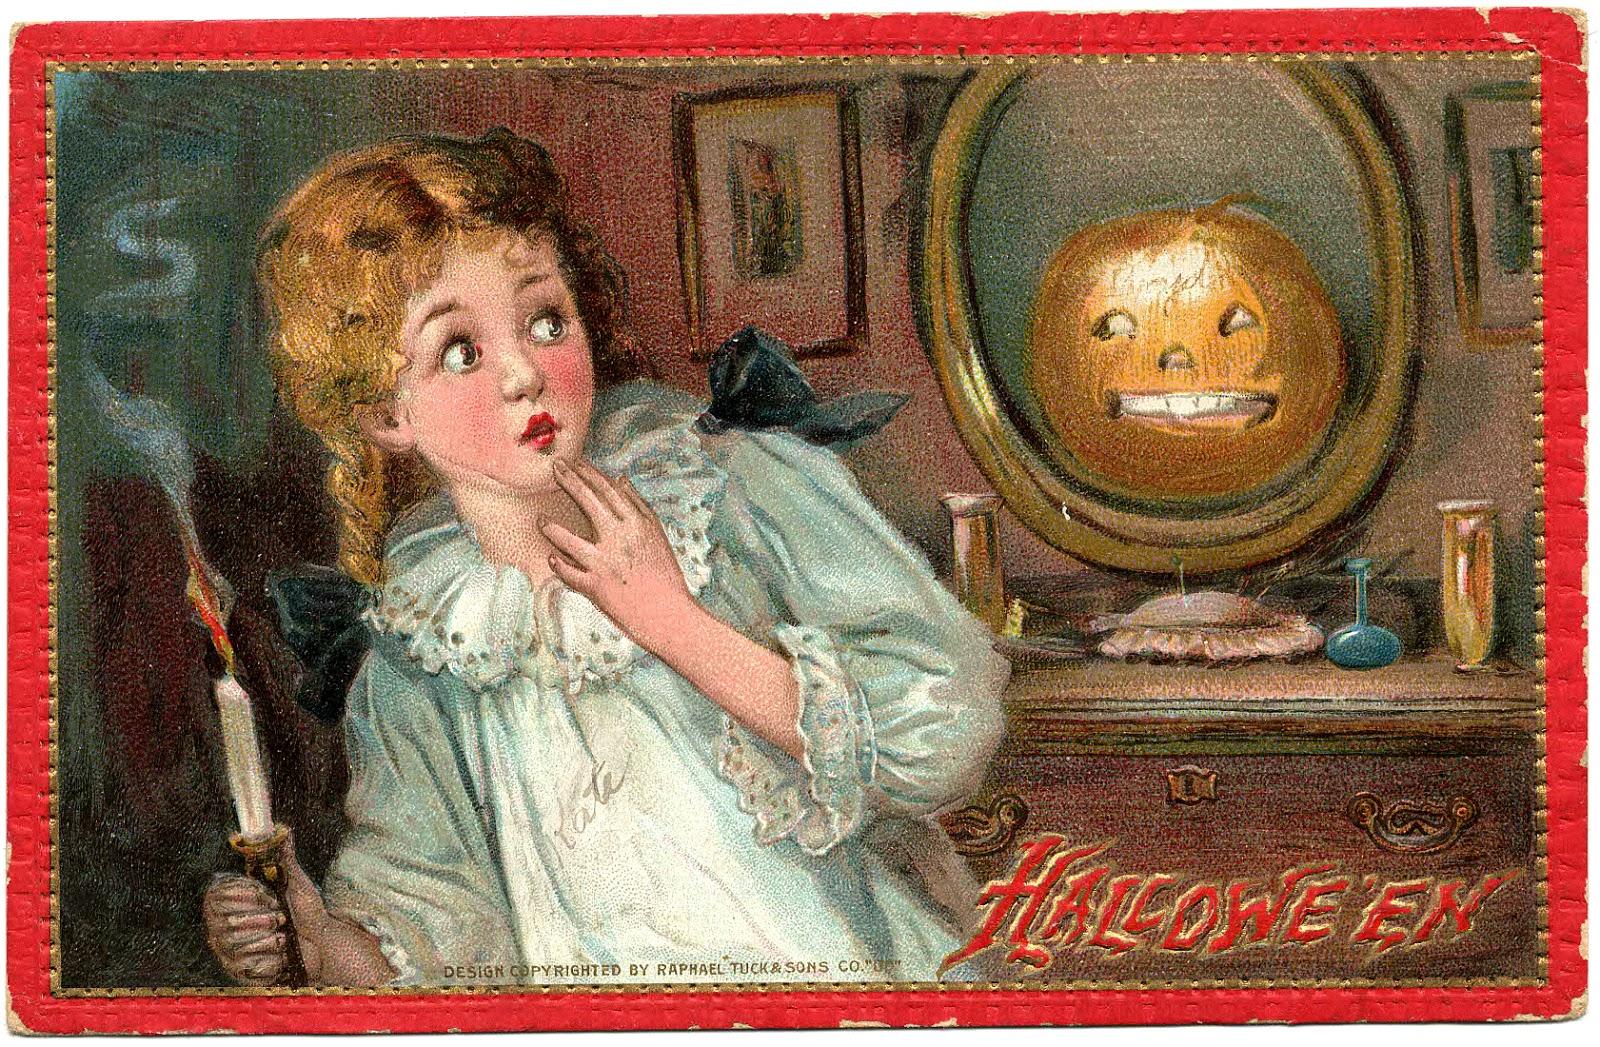 Papergreat Spooky Tuck Sons Hallowe En Postcard Mailed In 1910